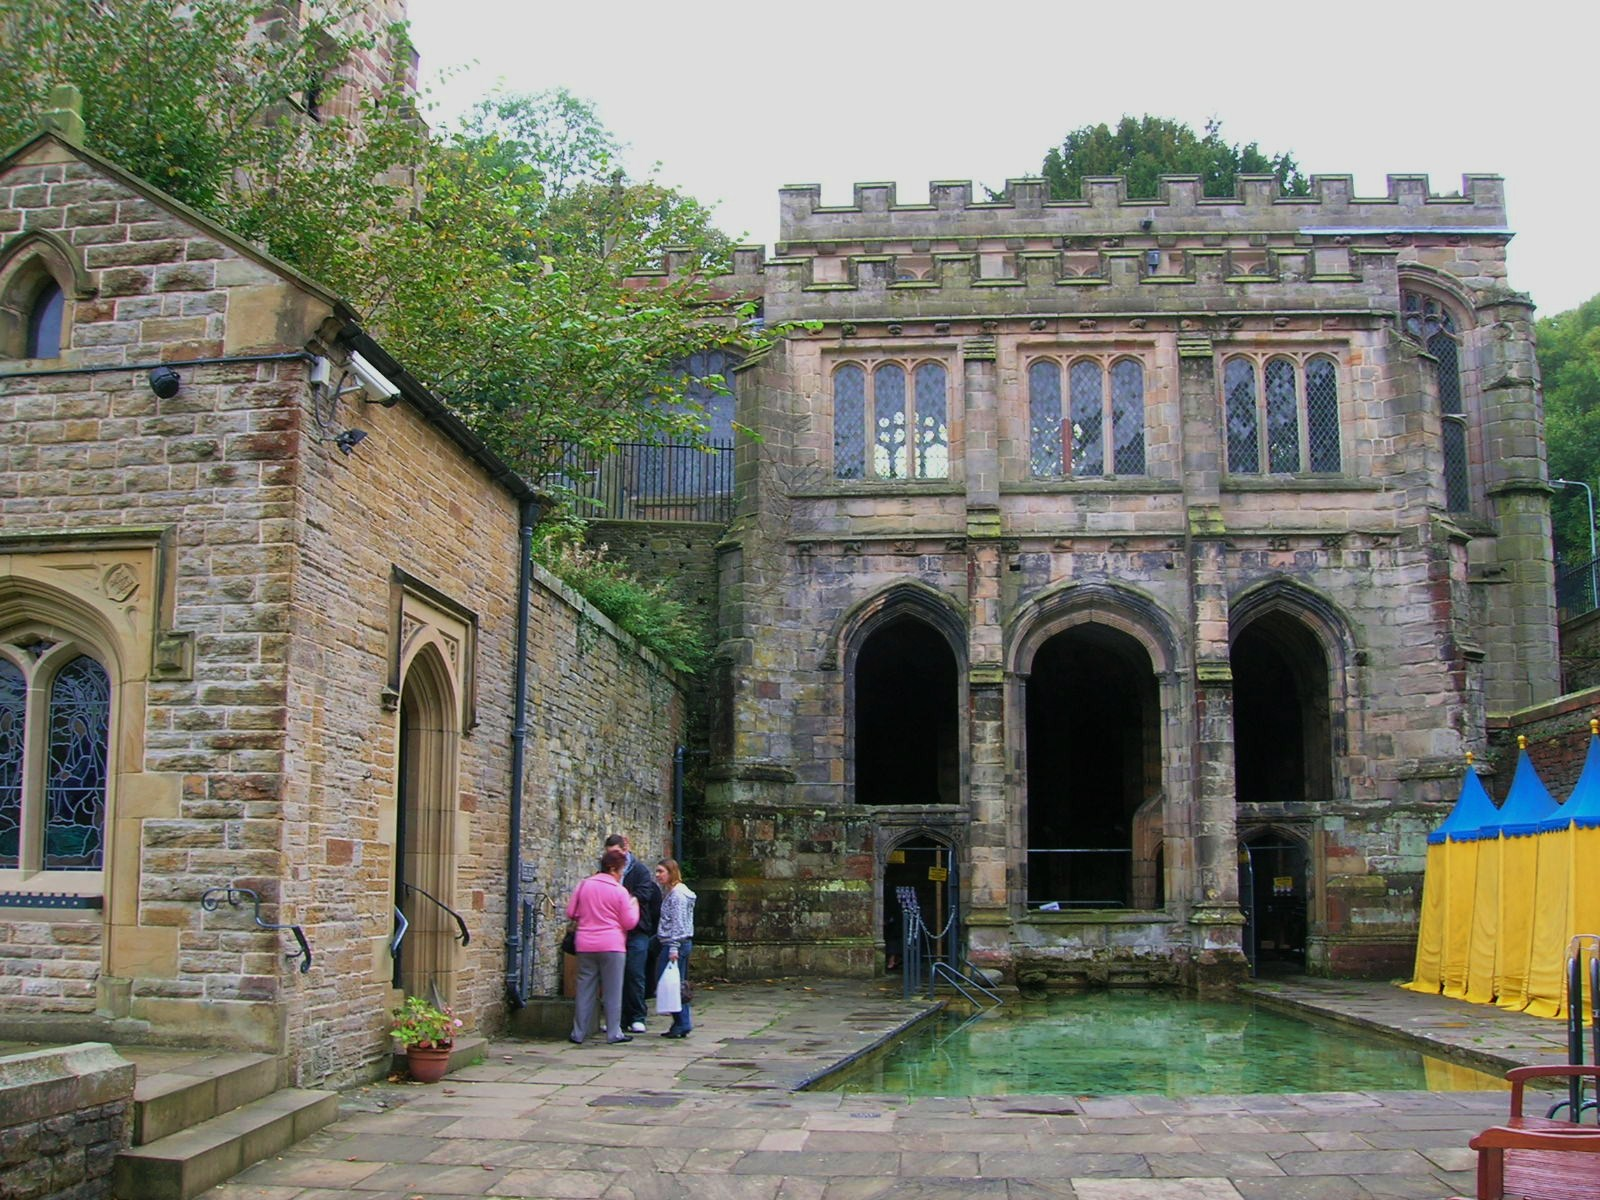 St Winefride's Çeşmesi, Holywell